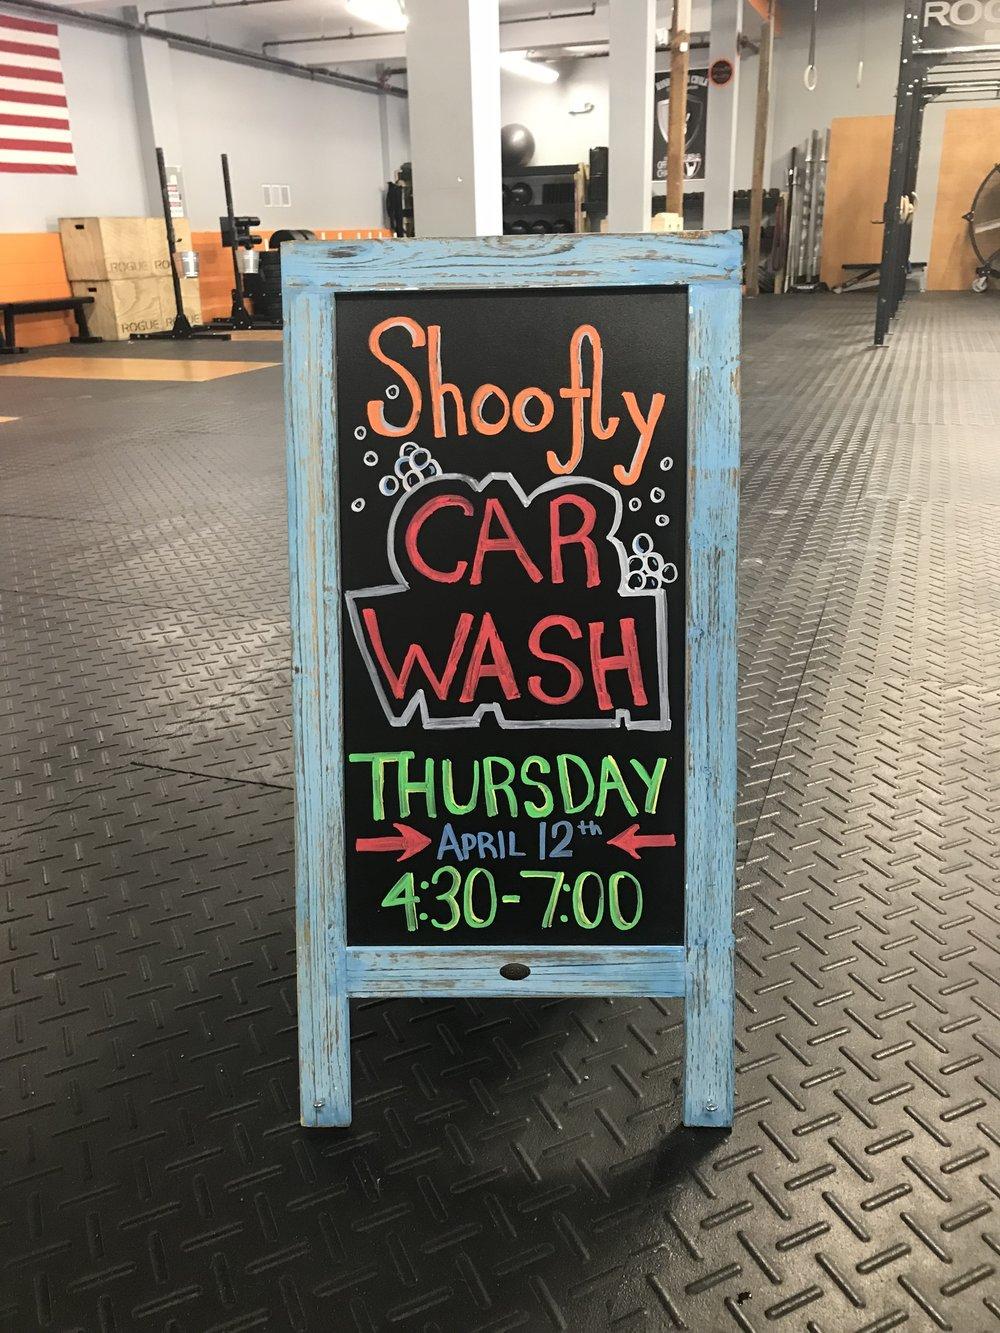 shoofly car wash.JPG